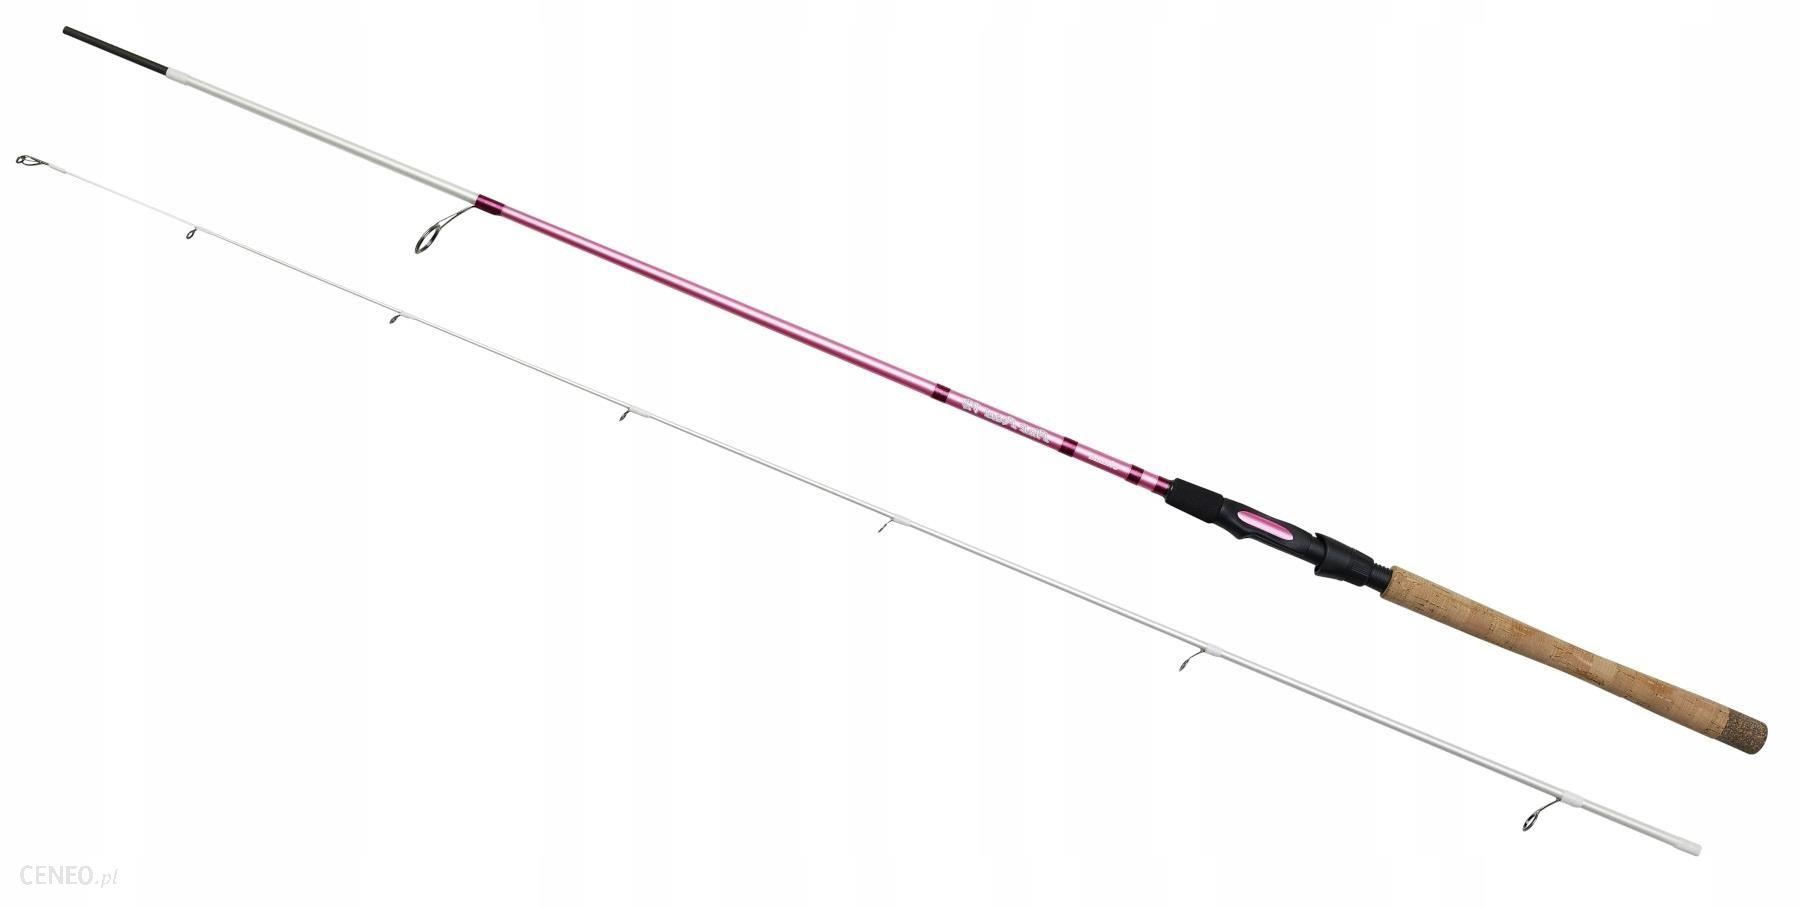 Wędka Okuma Pink Pearl V2 249 10-32g